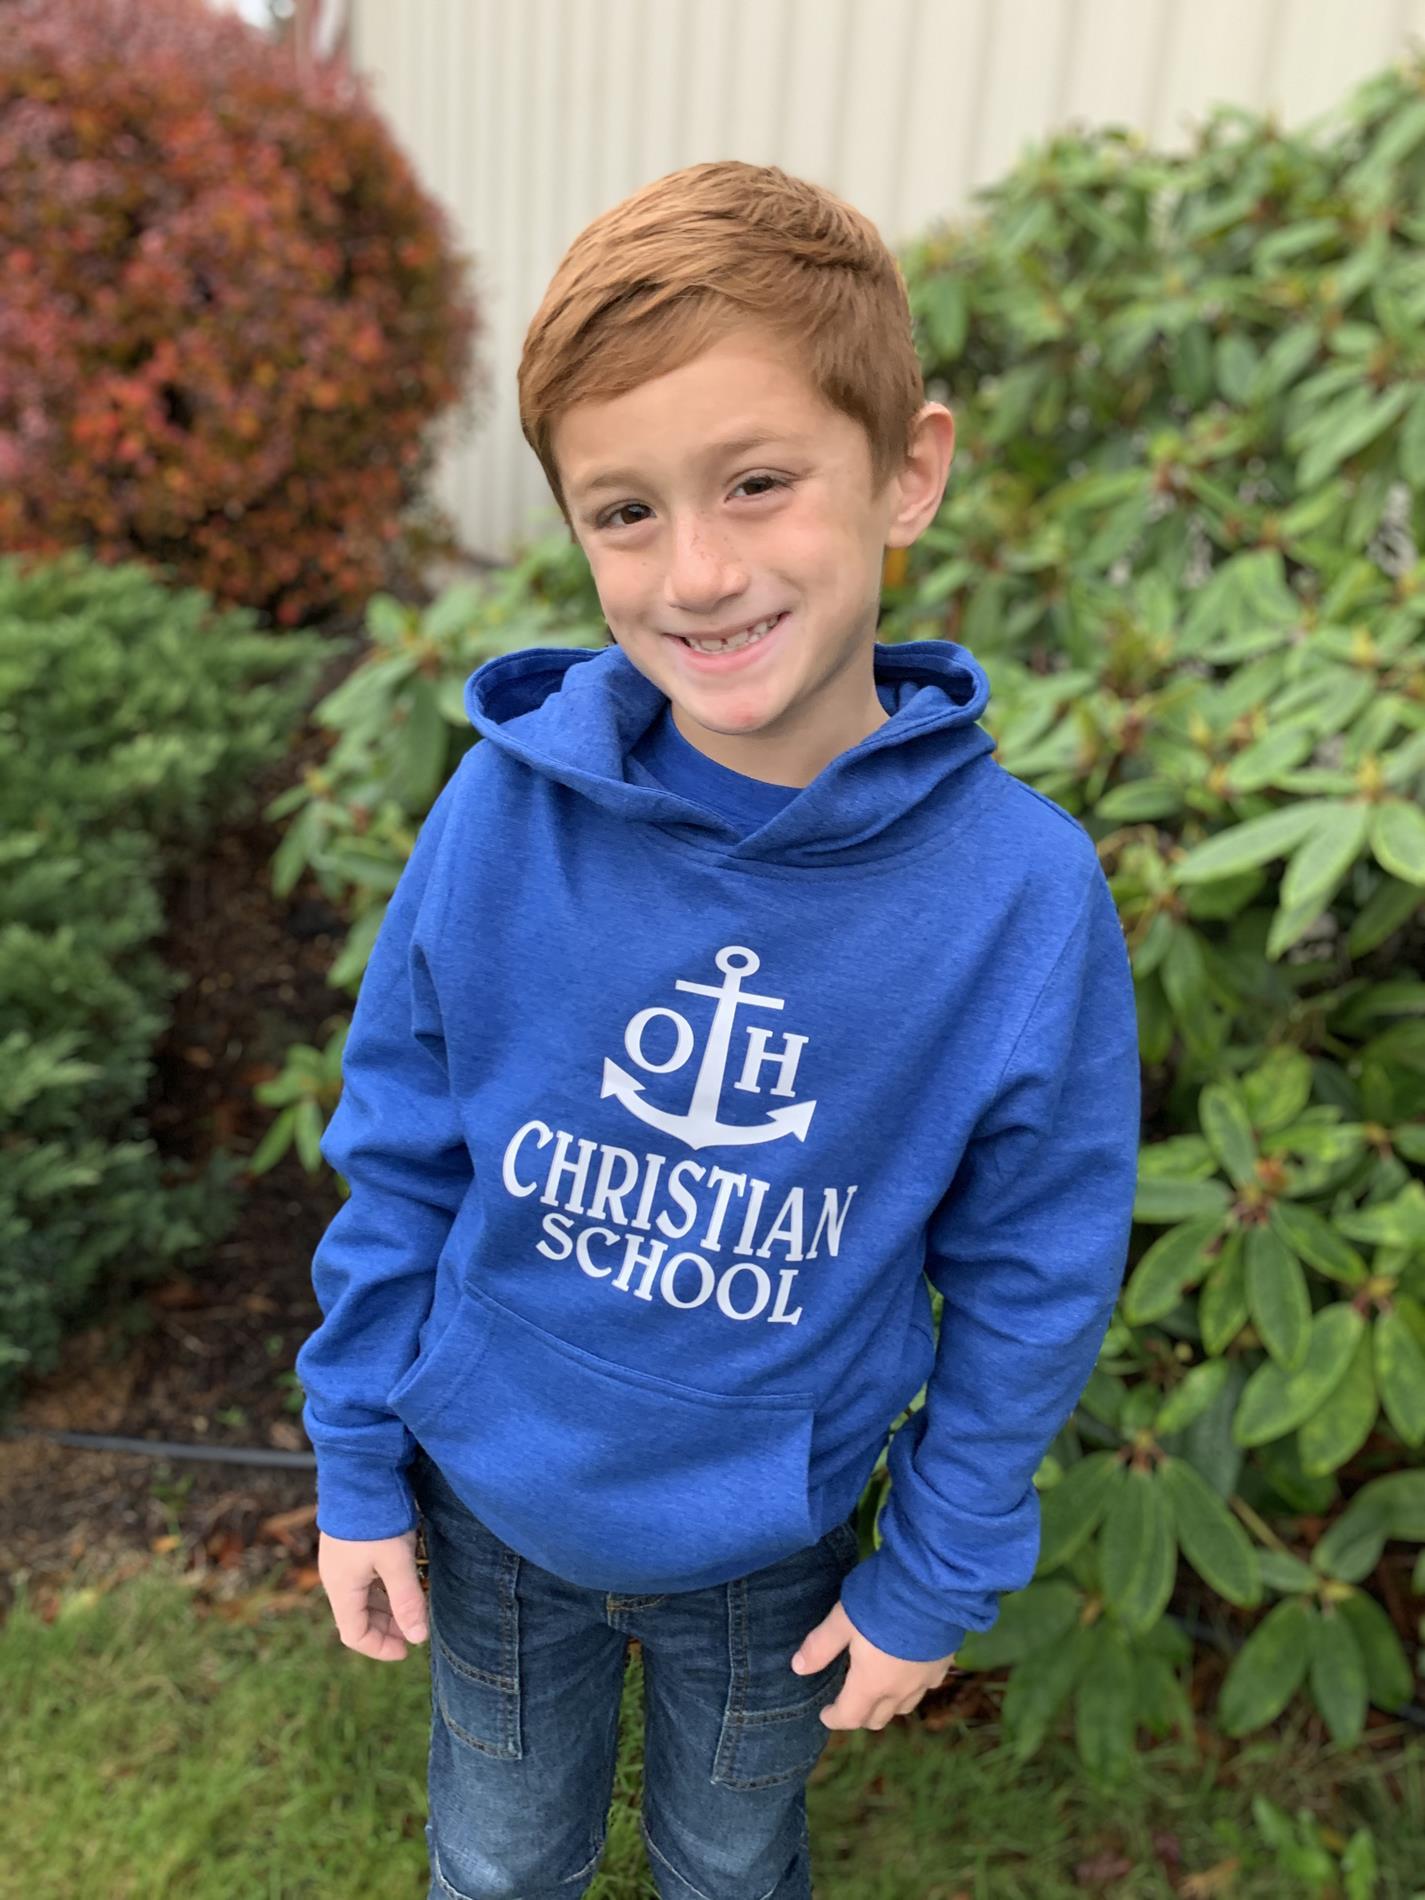 Preschool size sweatshirt